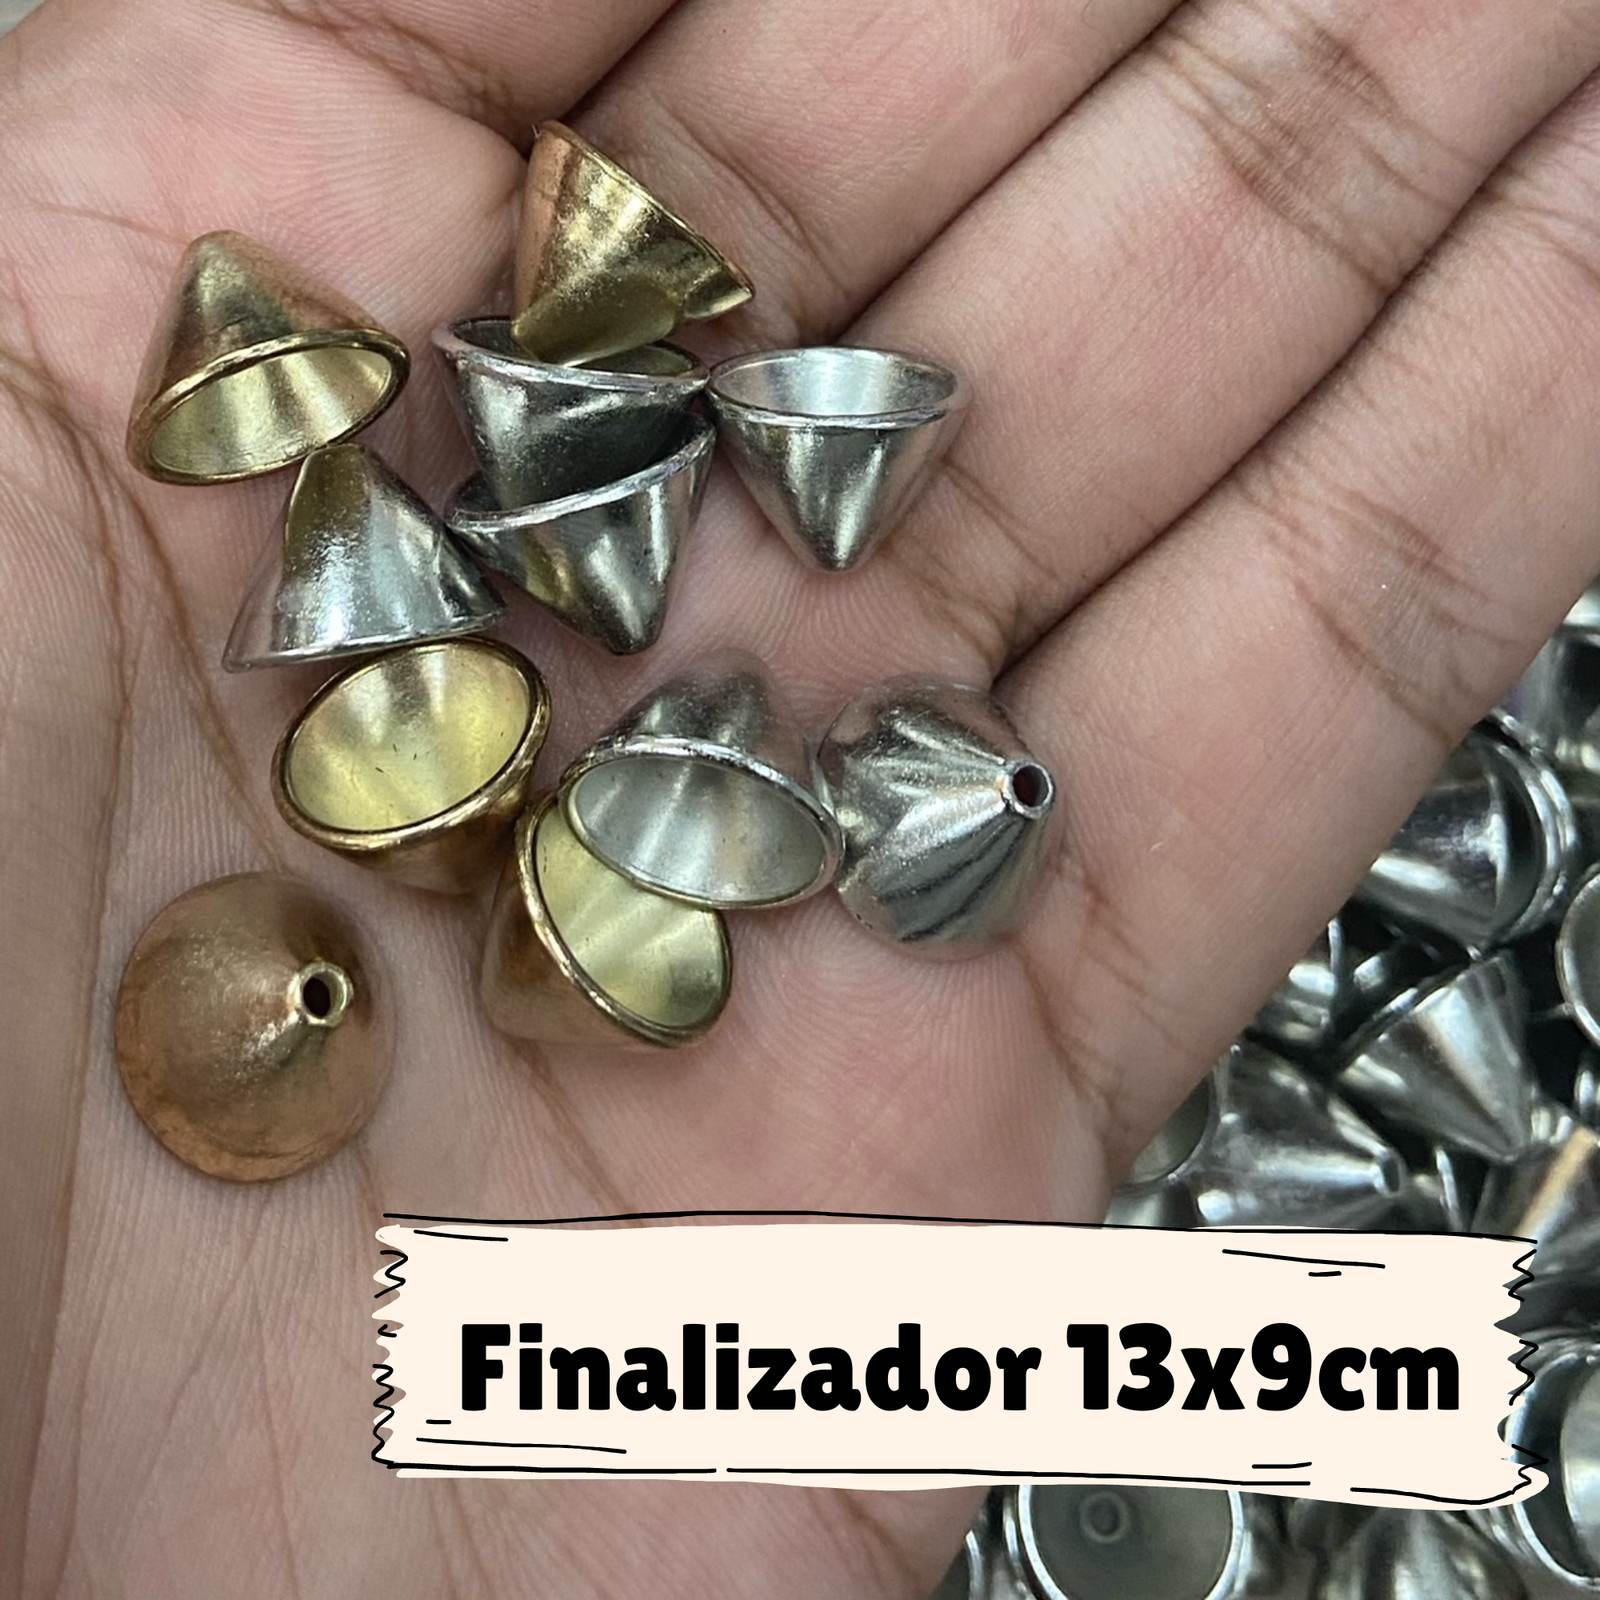 Finalizador 13x9 - 500g